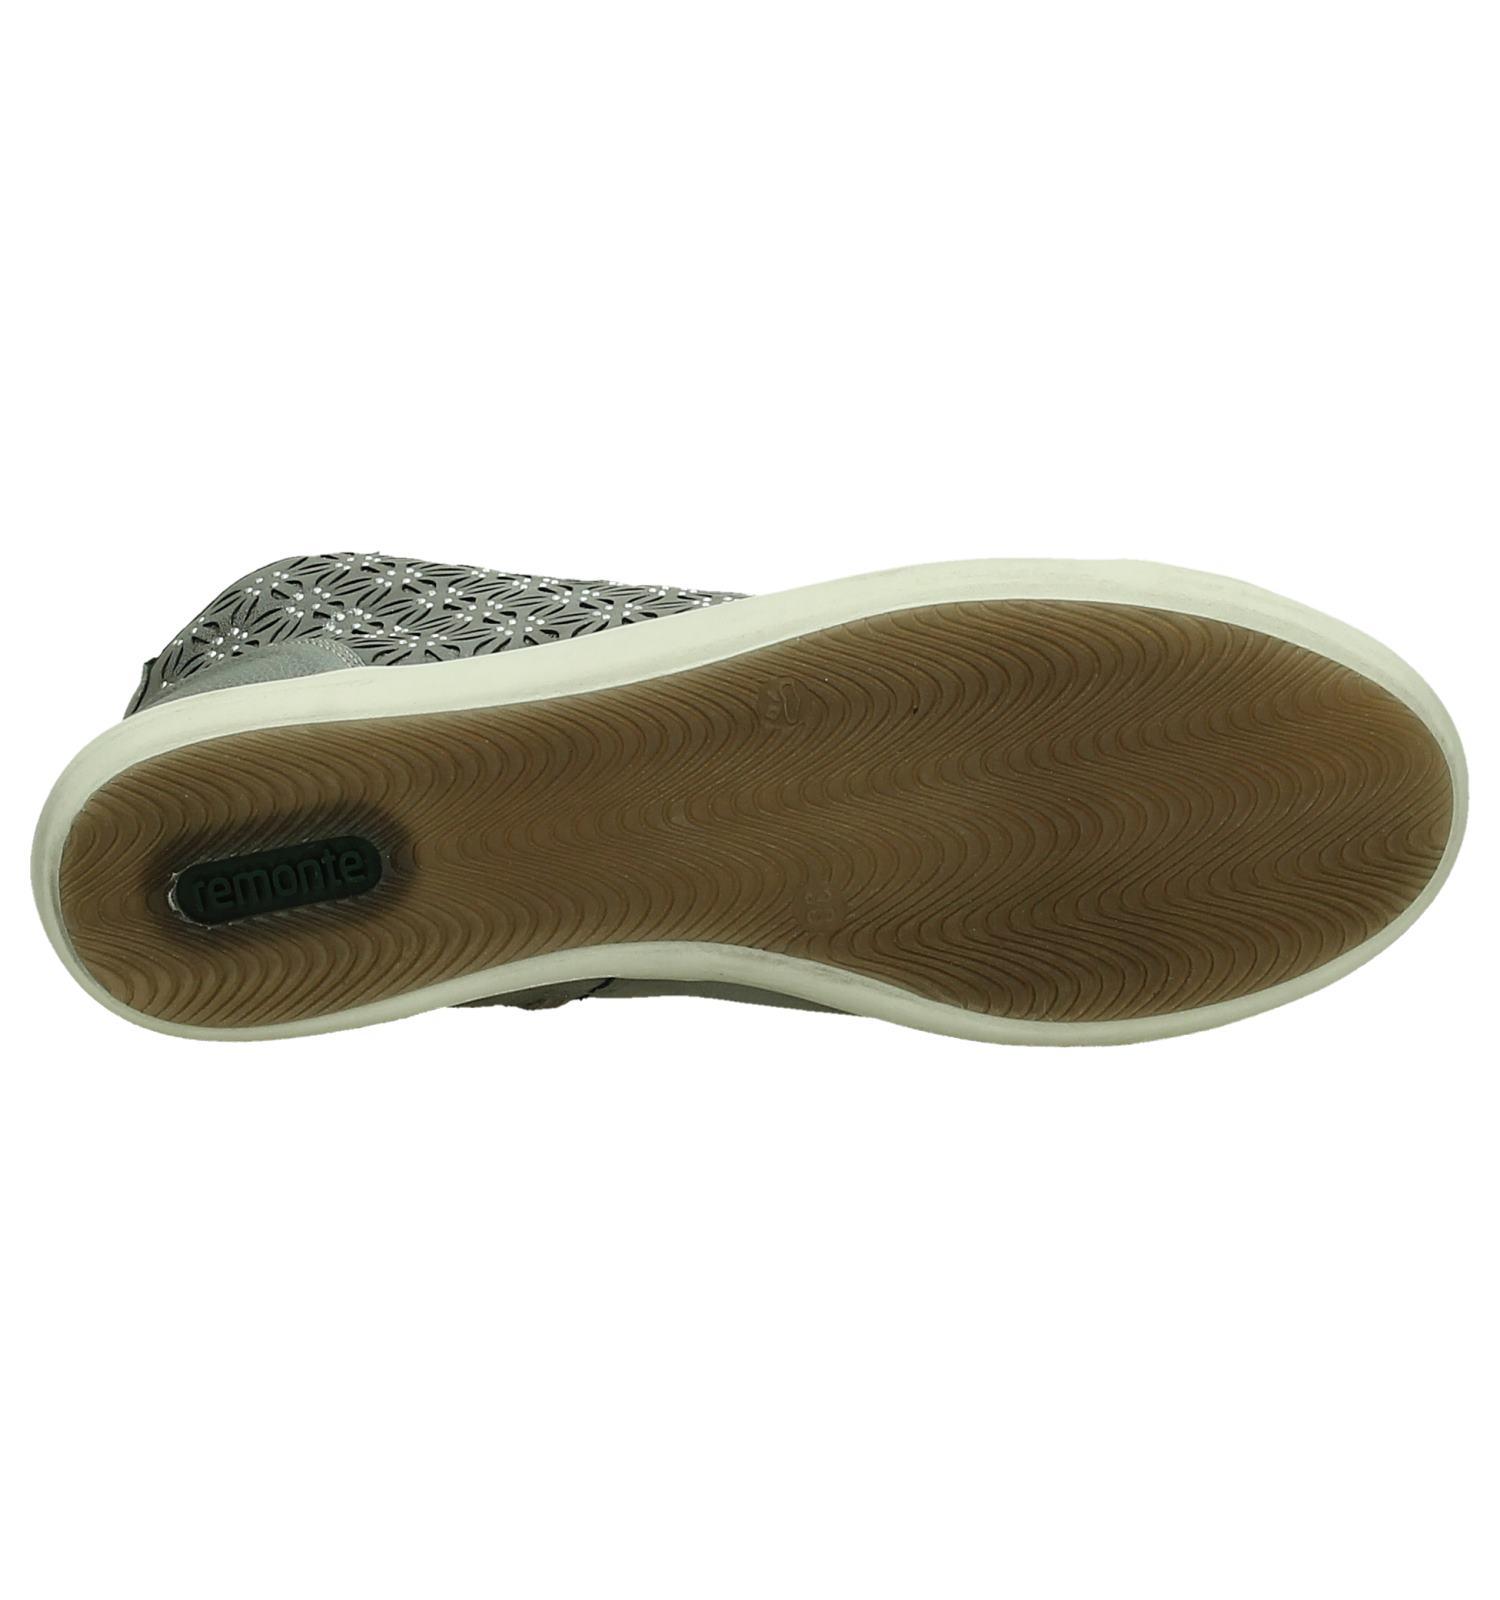 Remonte veter Sneaker Grijs Rits Grijs Remonte Sneaker 4R3AjL5